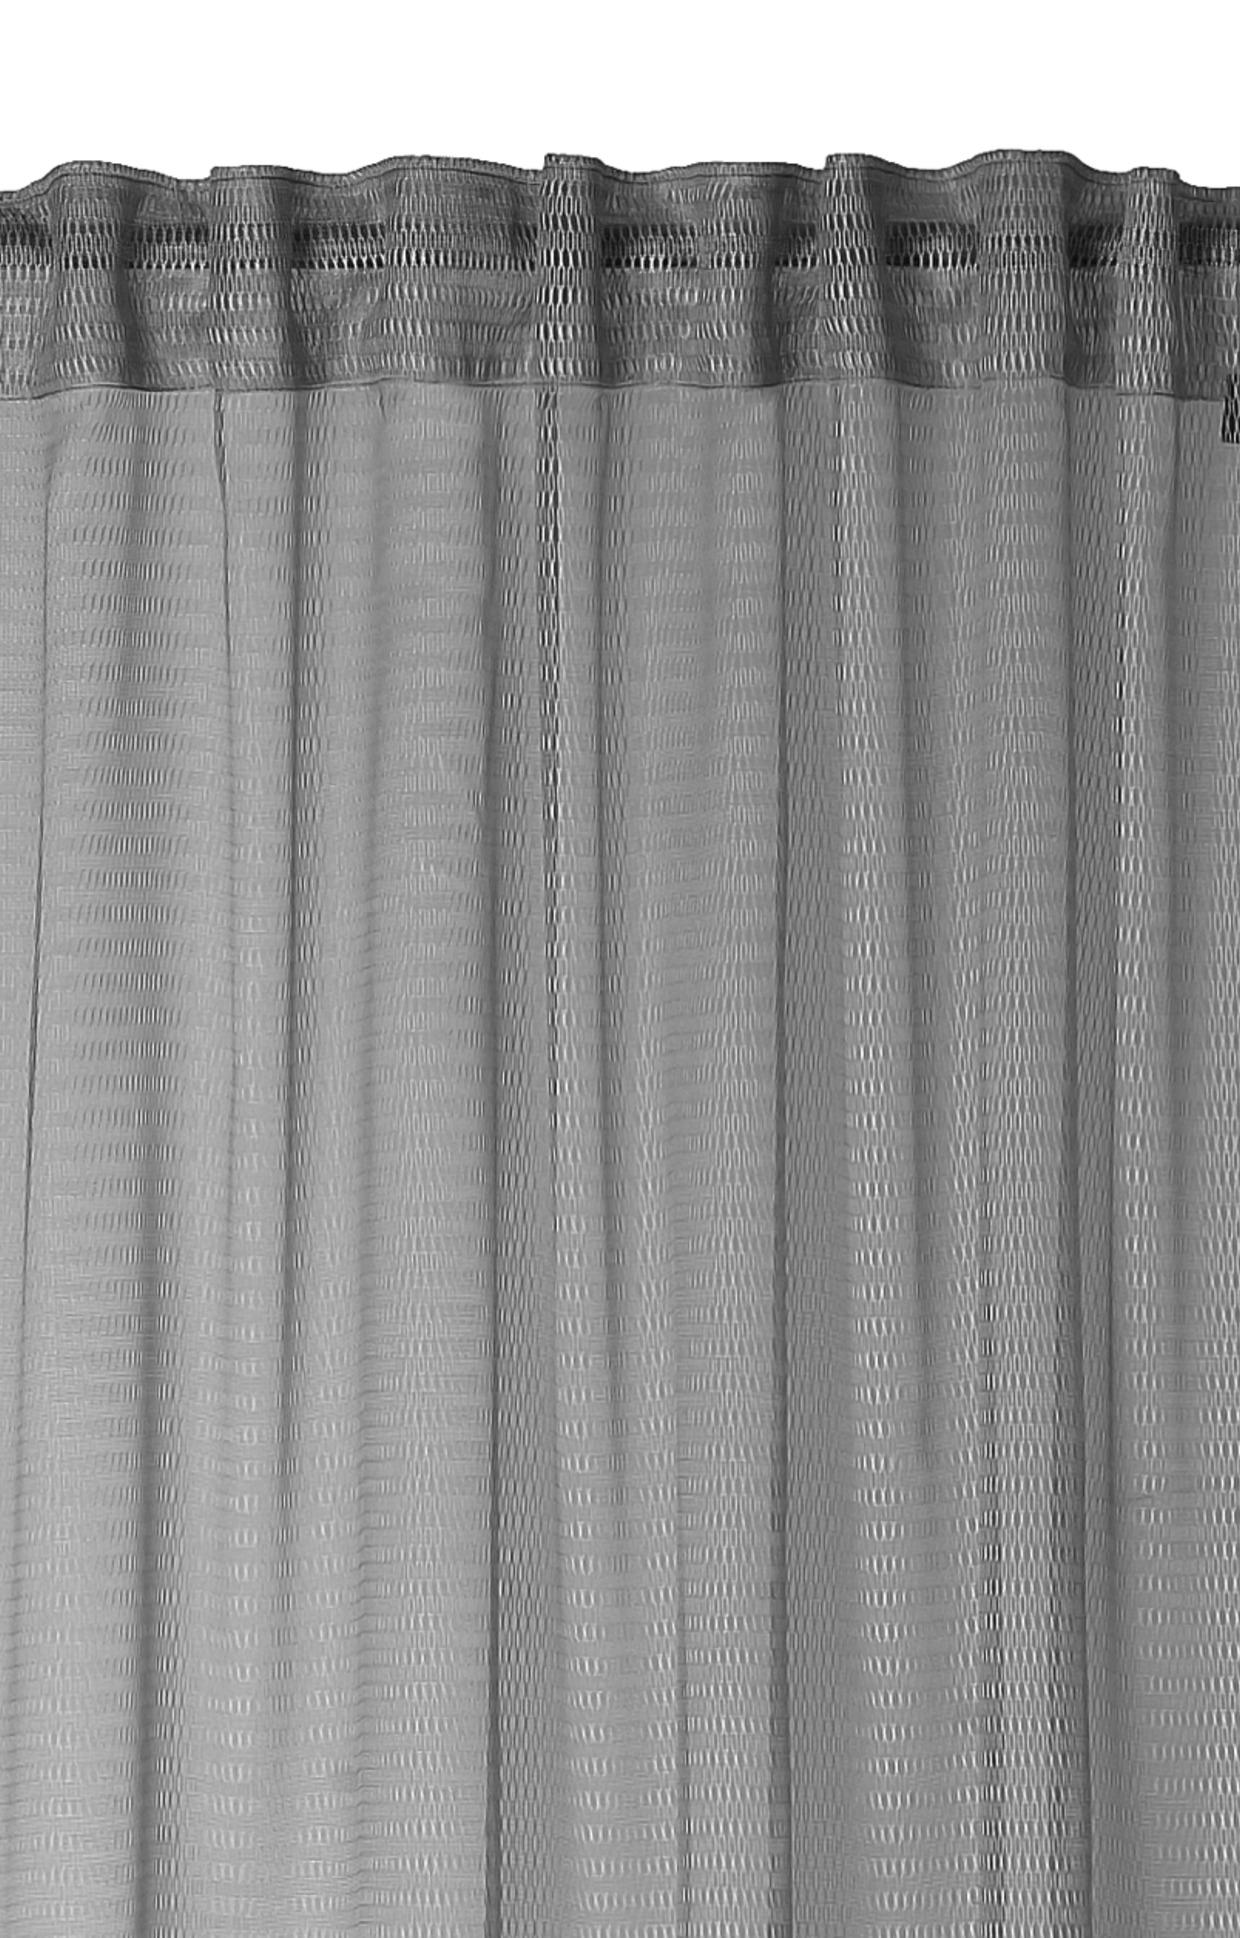 Full Size of Gardinen Fertig Gardine Delicate 130 250 Cm Betten Bad Für Schlafzimmer Fenster Wohnzimmer Scheibengardinen Küche Die Badezimmer Wohnzimmer Joop Gardinen